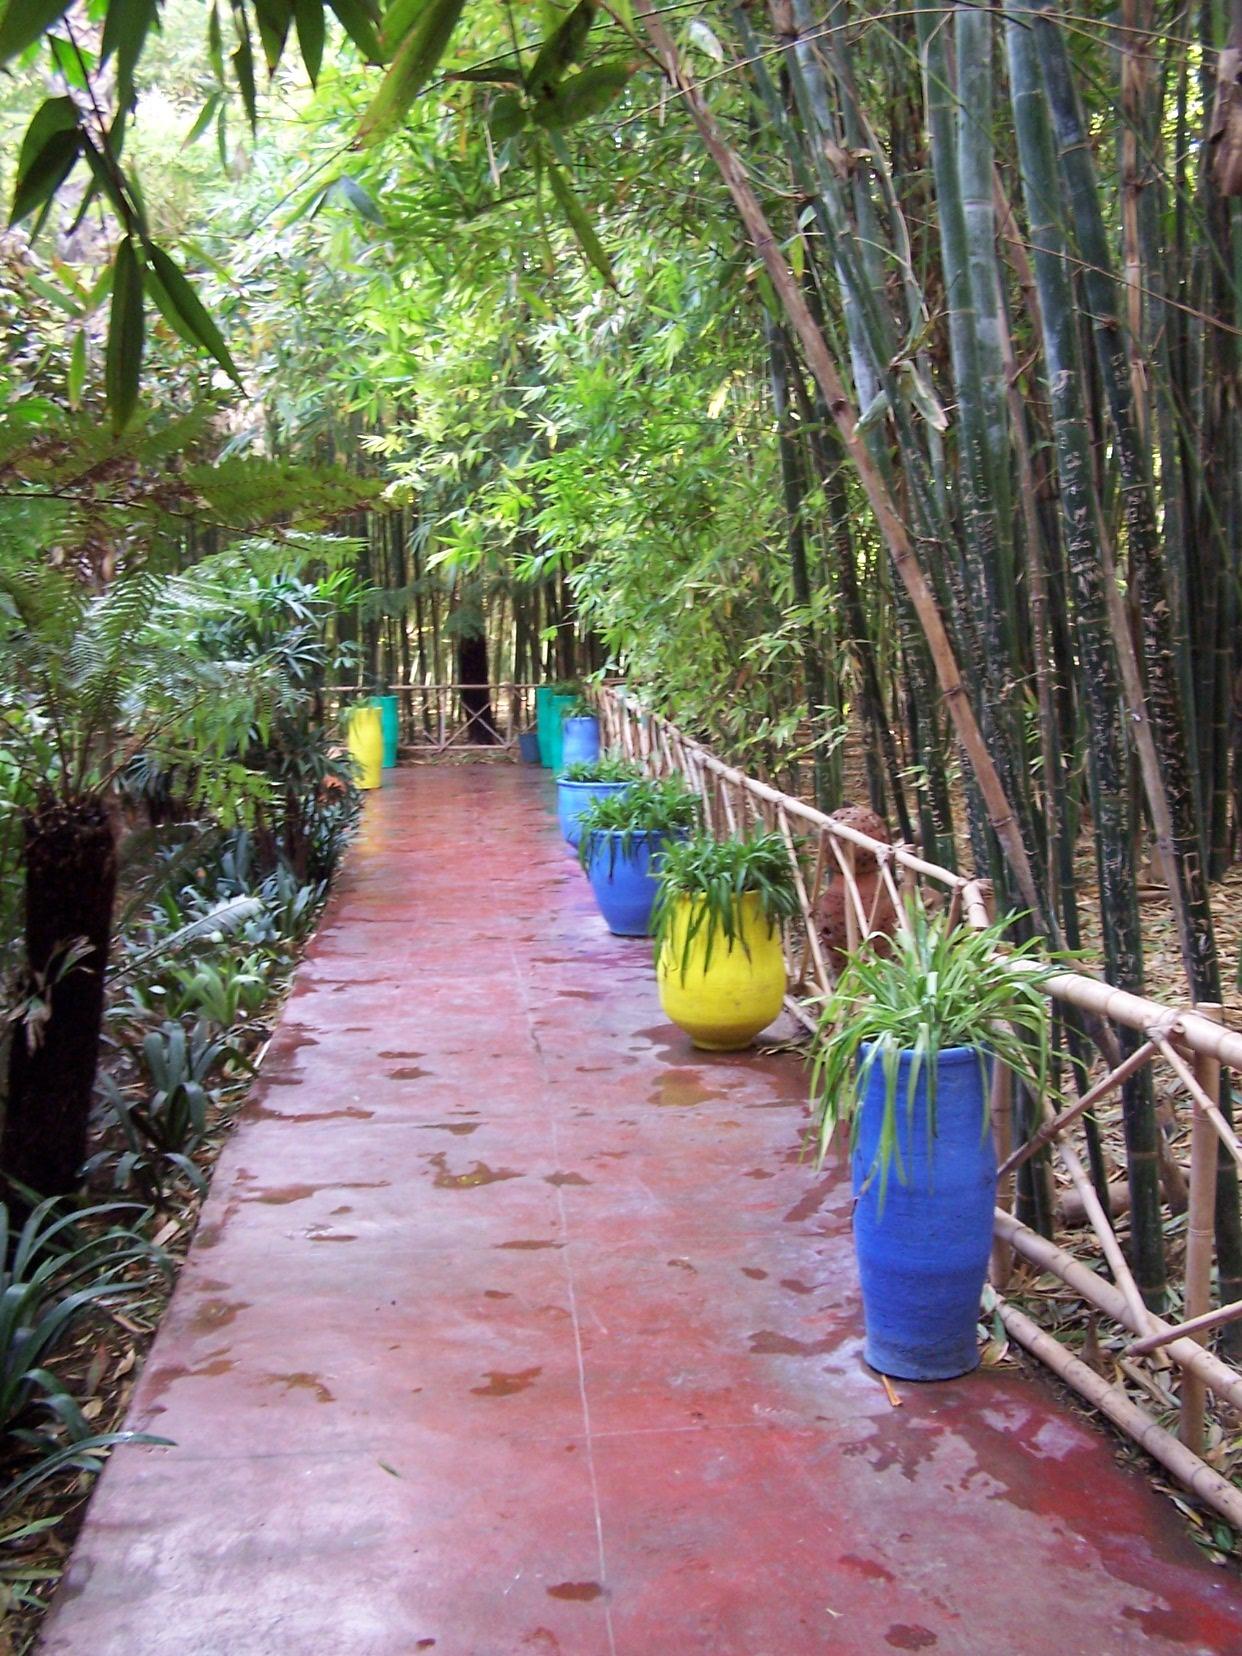 Méditation en marchant Jardin Majorelle Marakech Maroc 2008